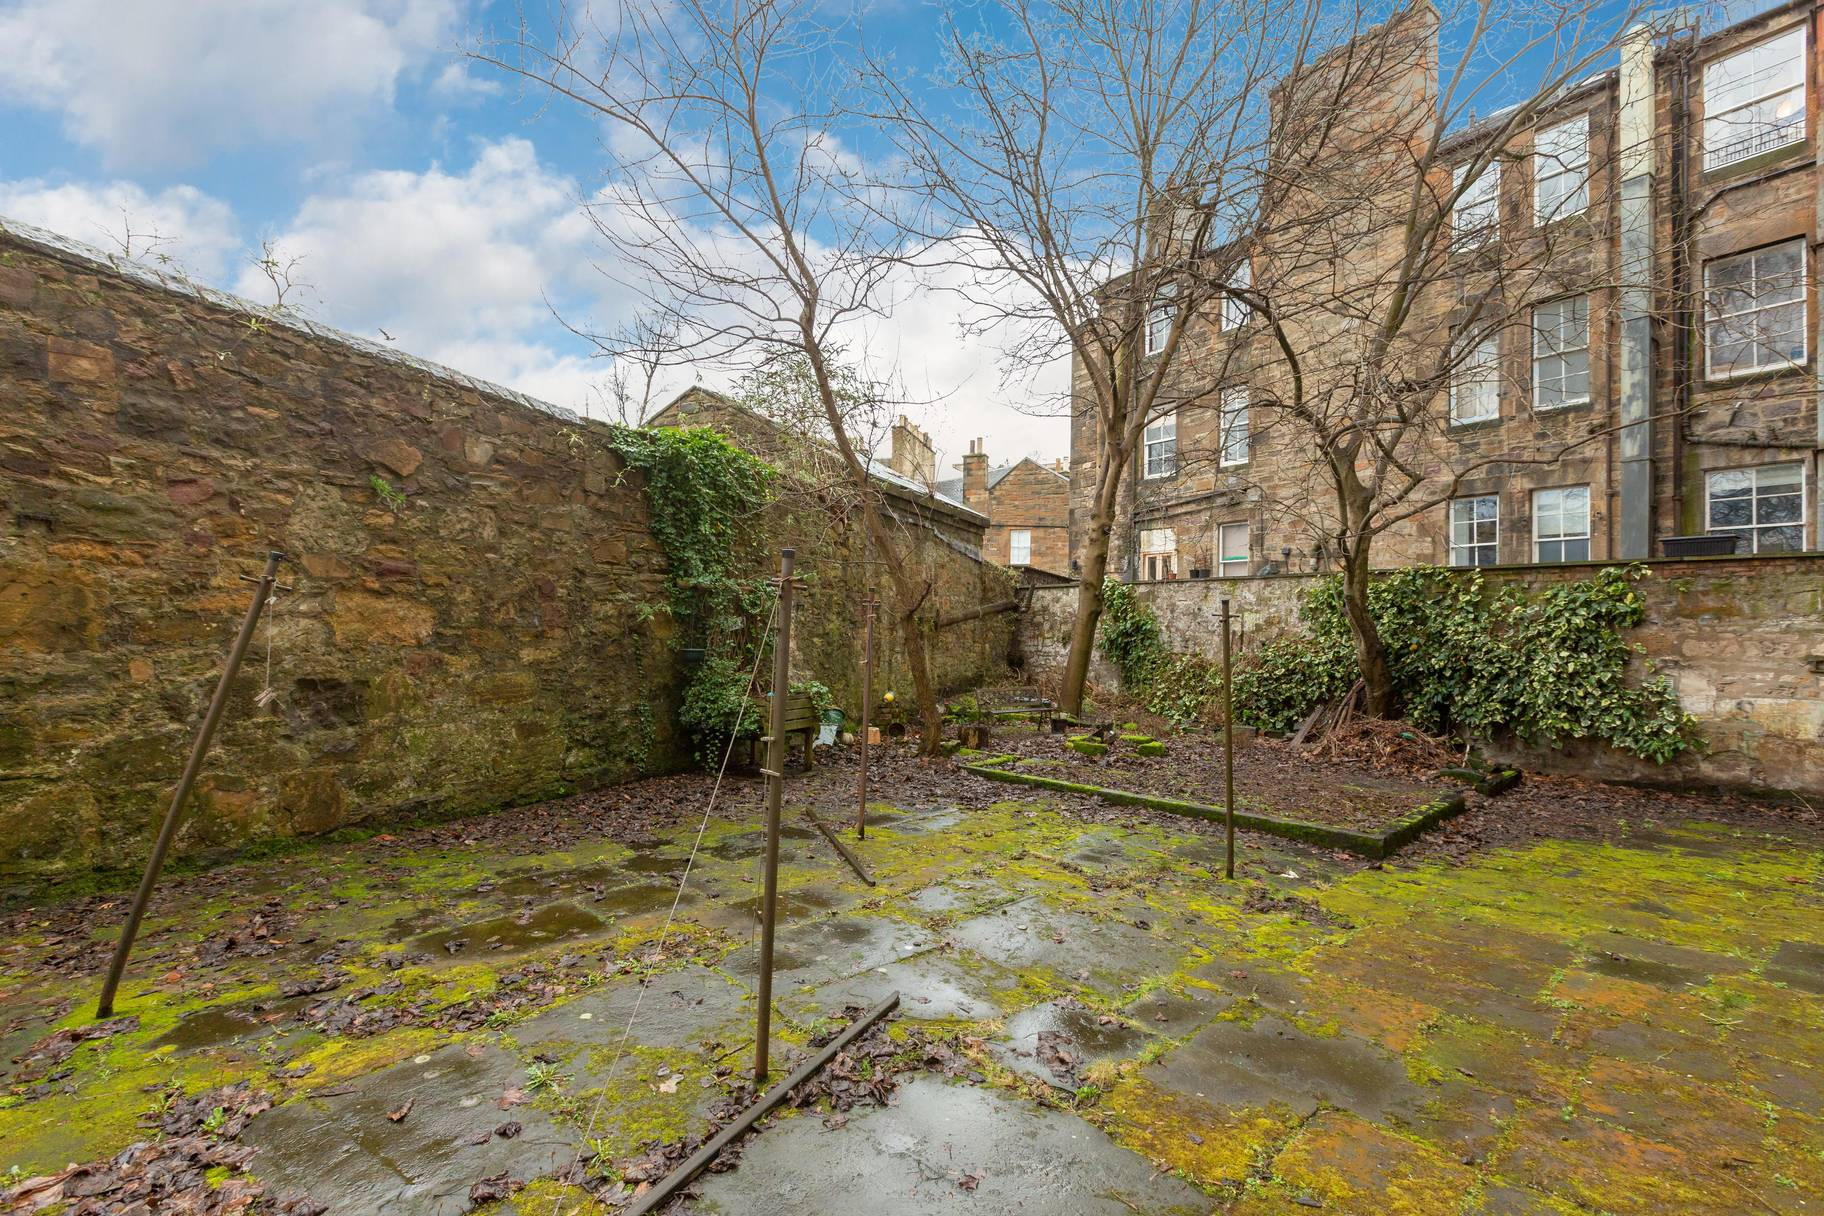 1/1 Forrest Hill, Old Town, Edinburgh, EH1 2QL